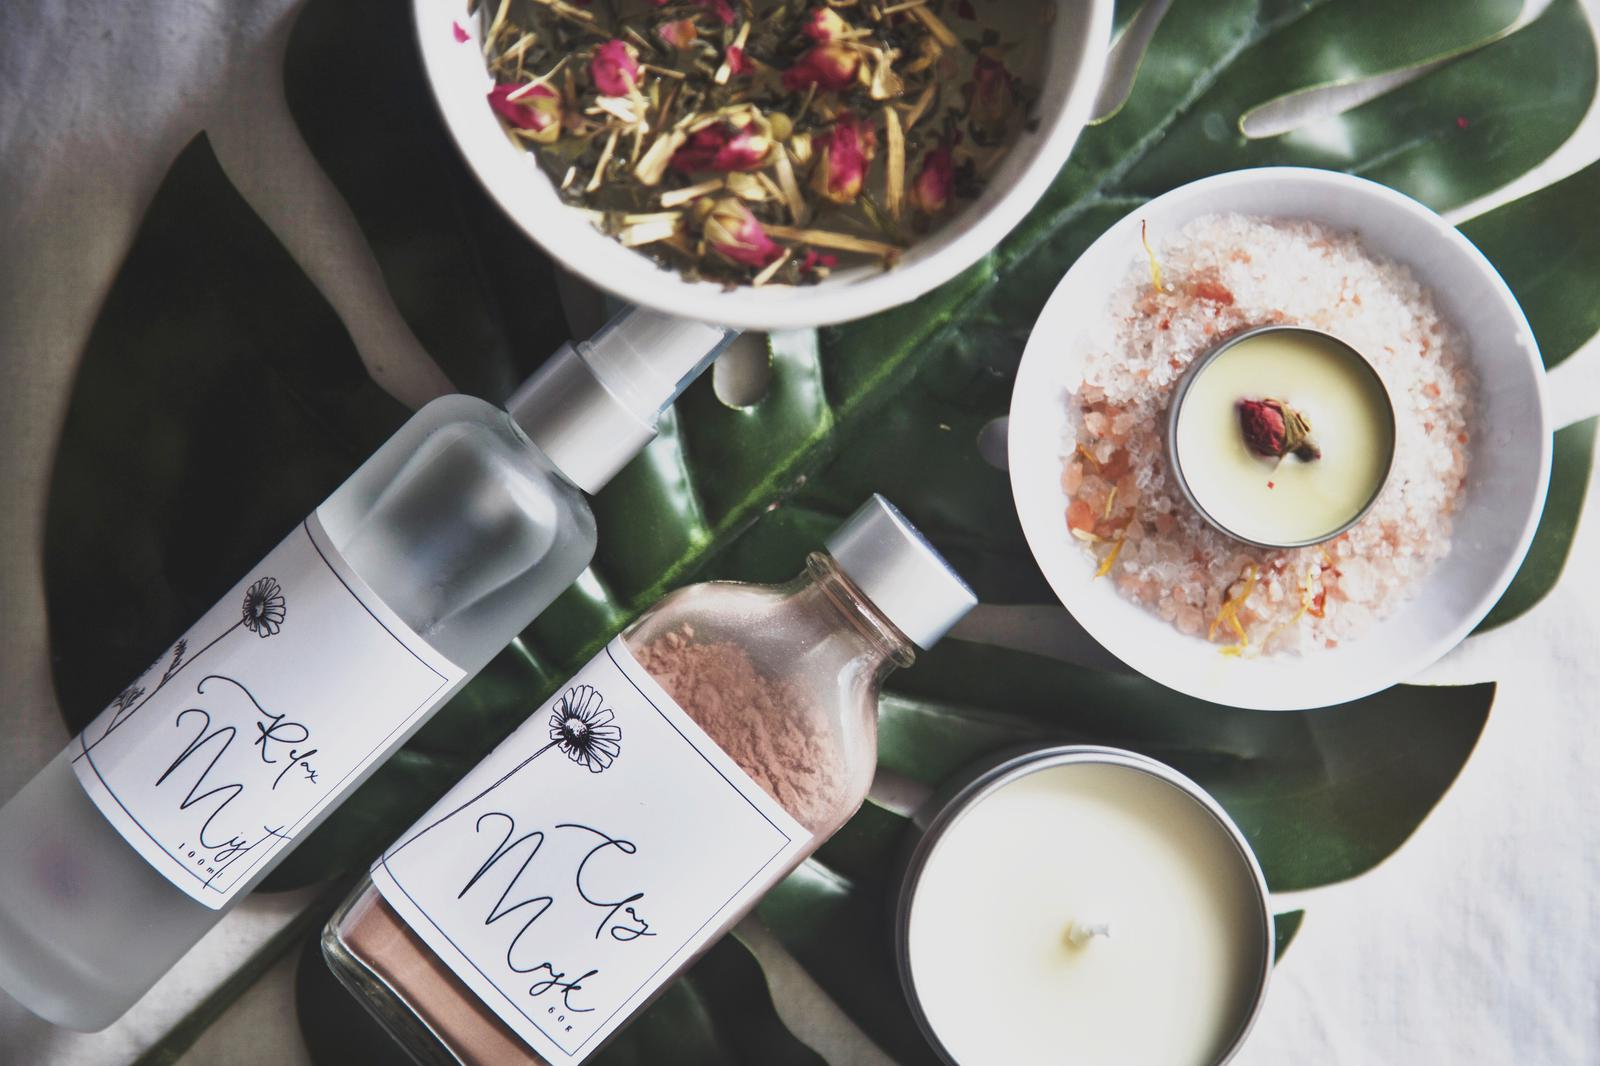 Naturopathic Blend Herbal Teas & Natural Skincare